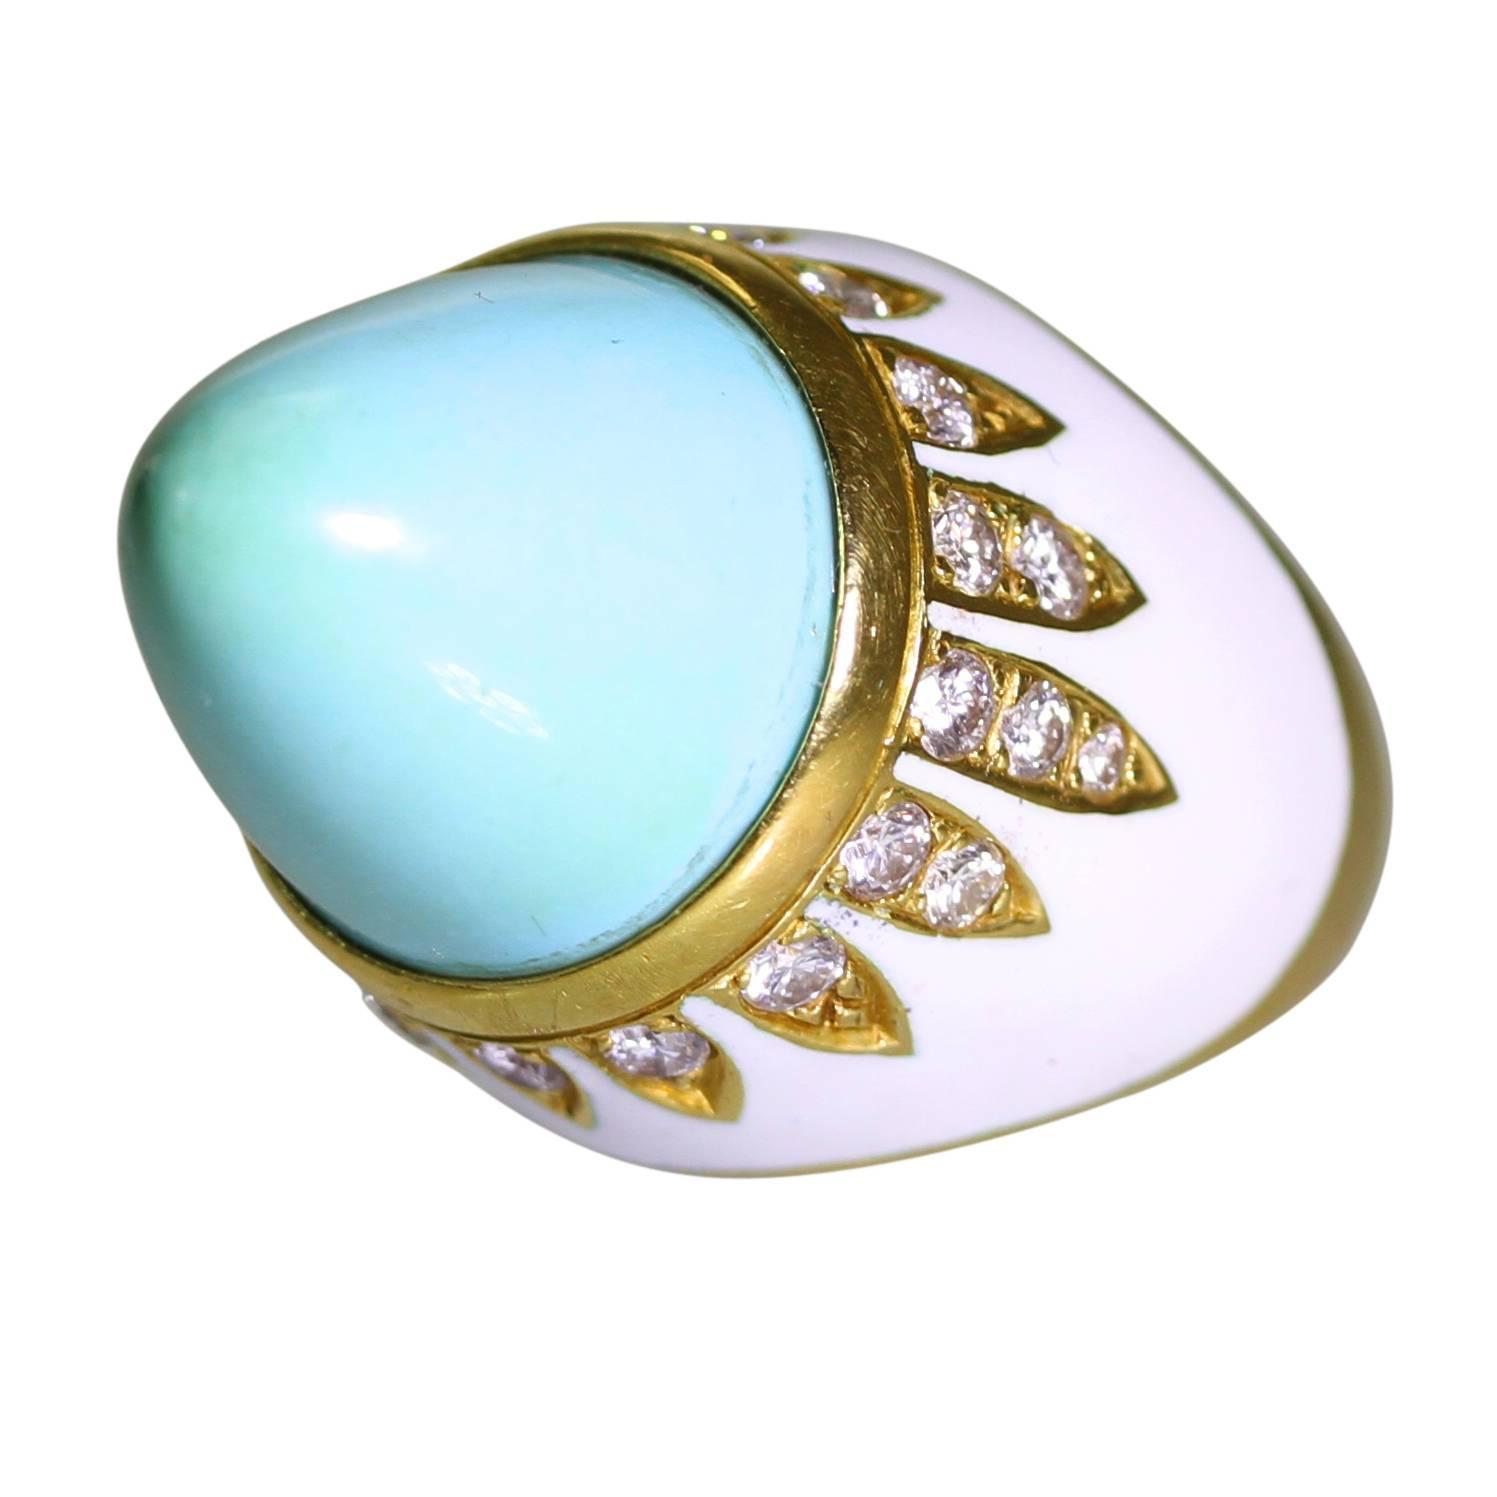 1970s enamel turquoise gold ring at 1stdibs